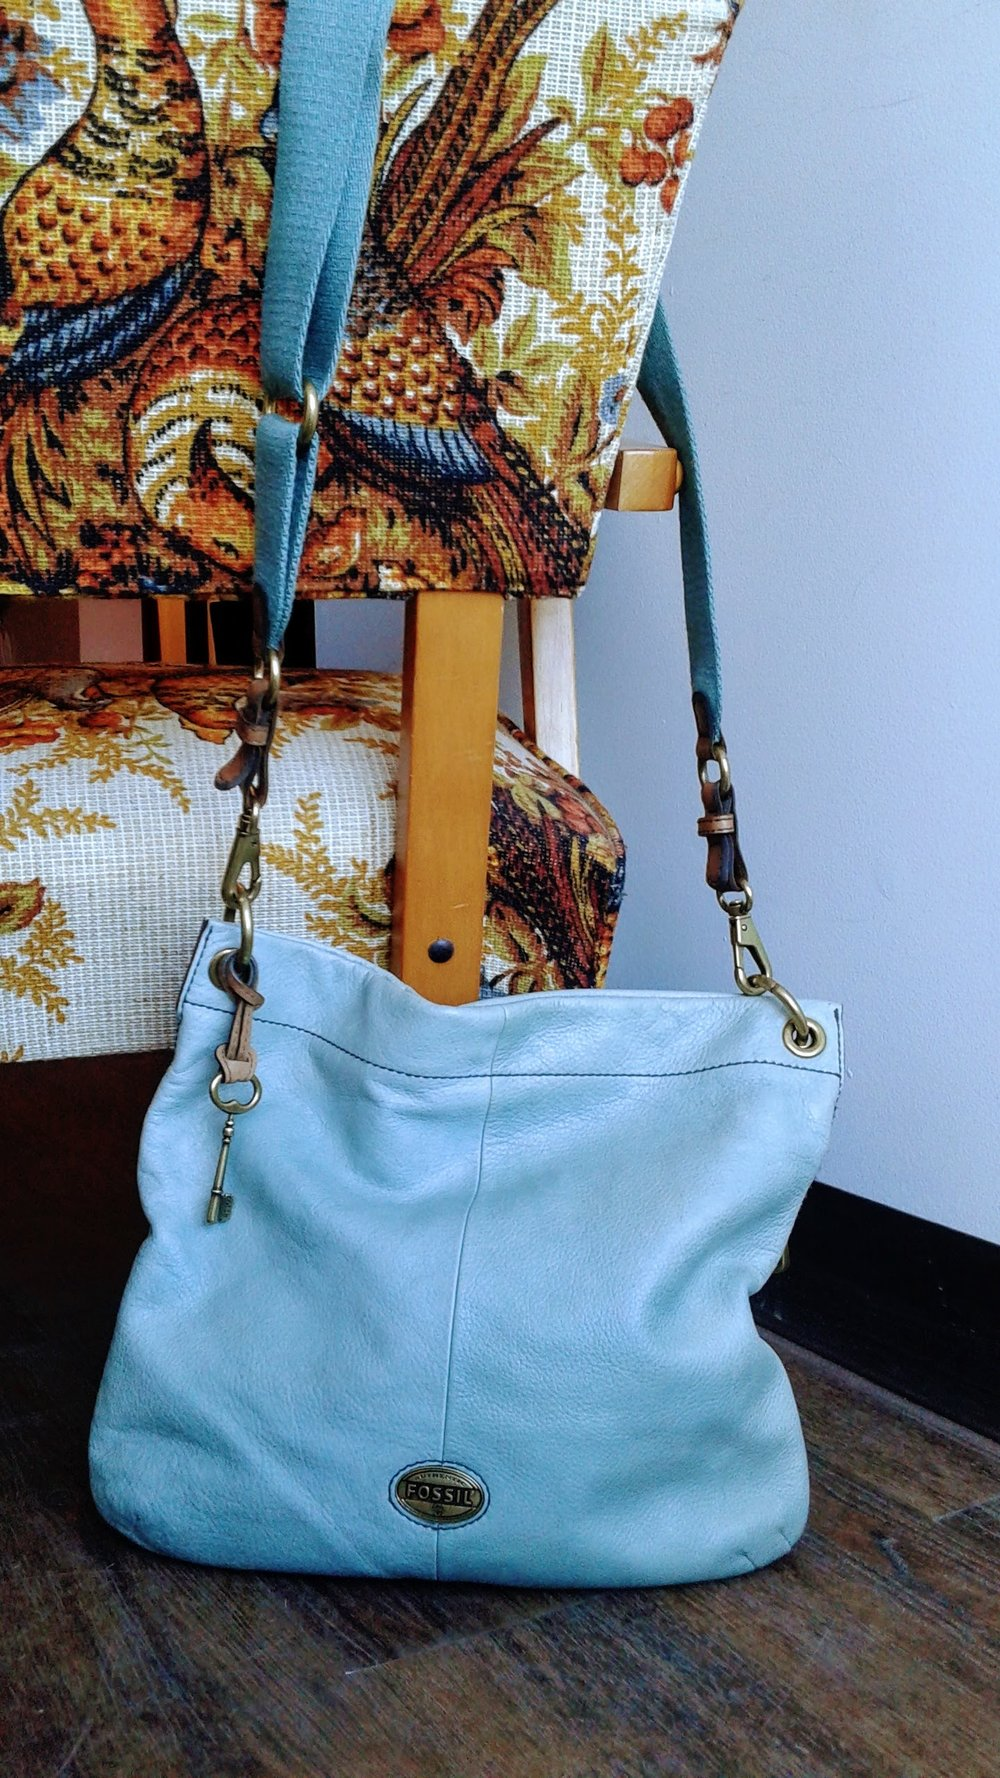 Fossil purse, $58